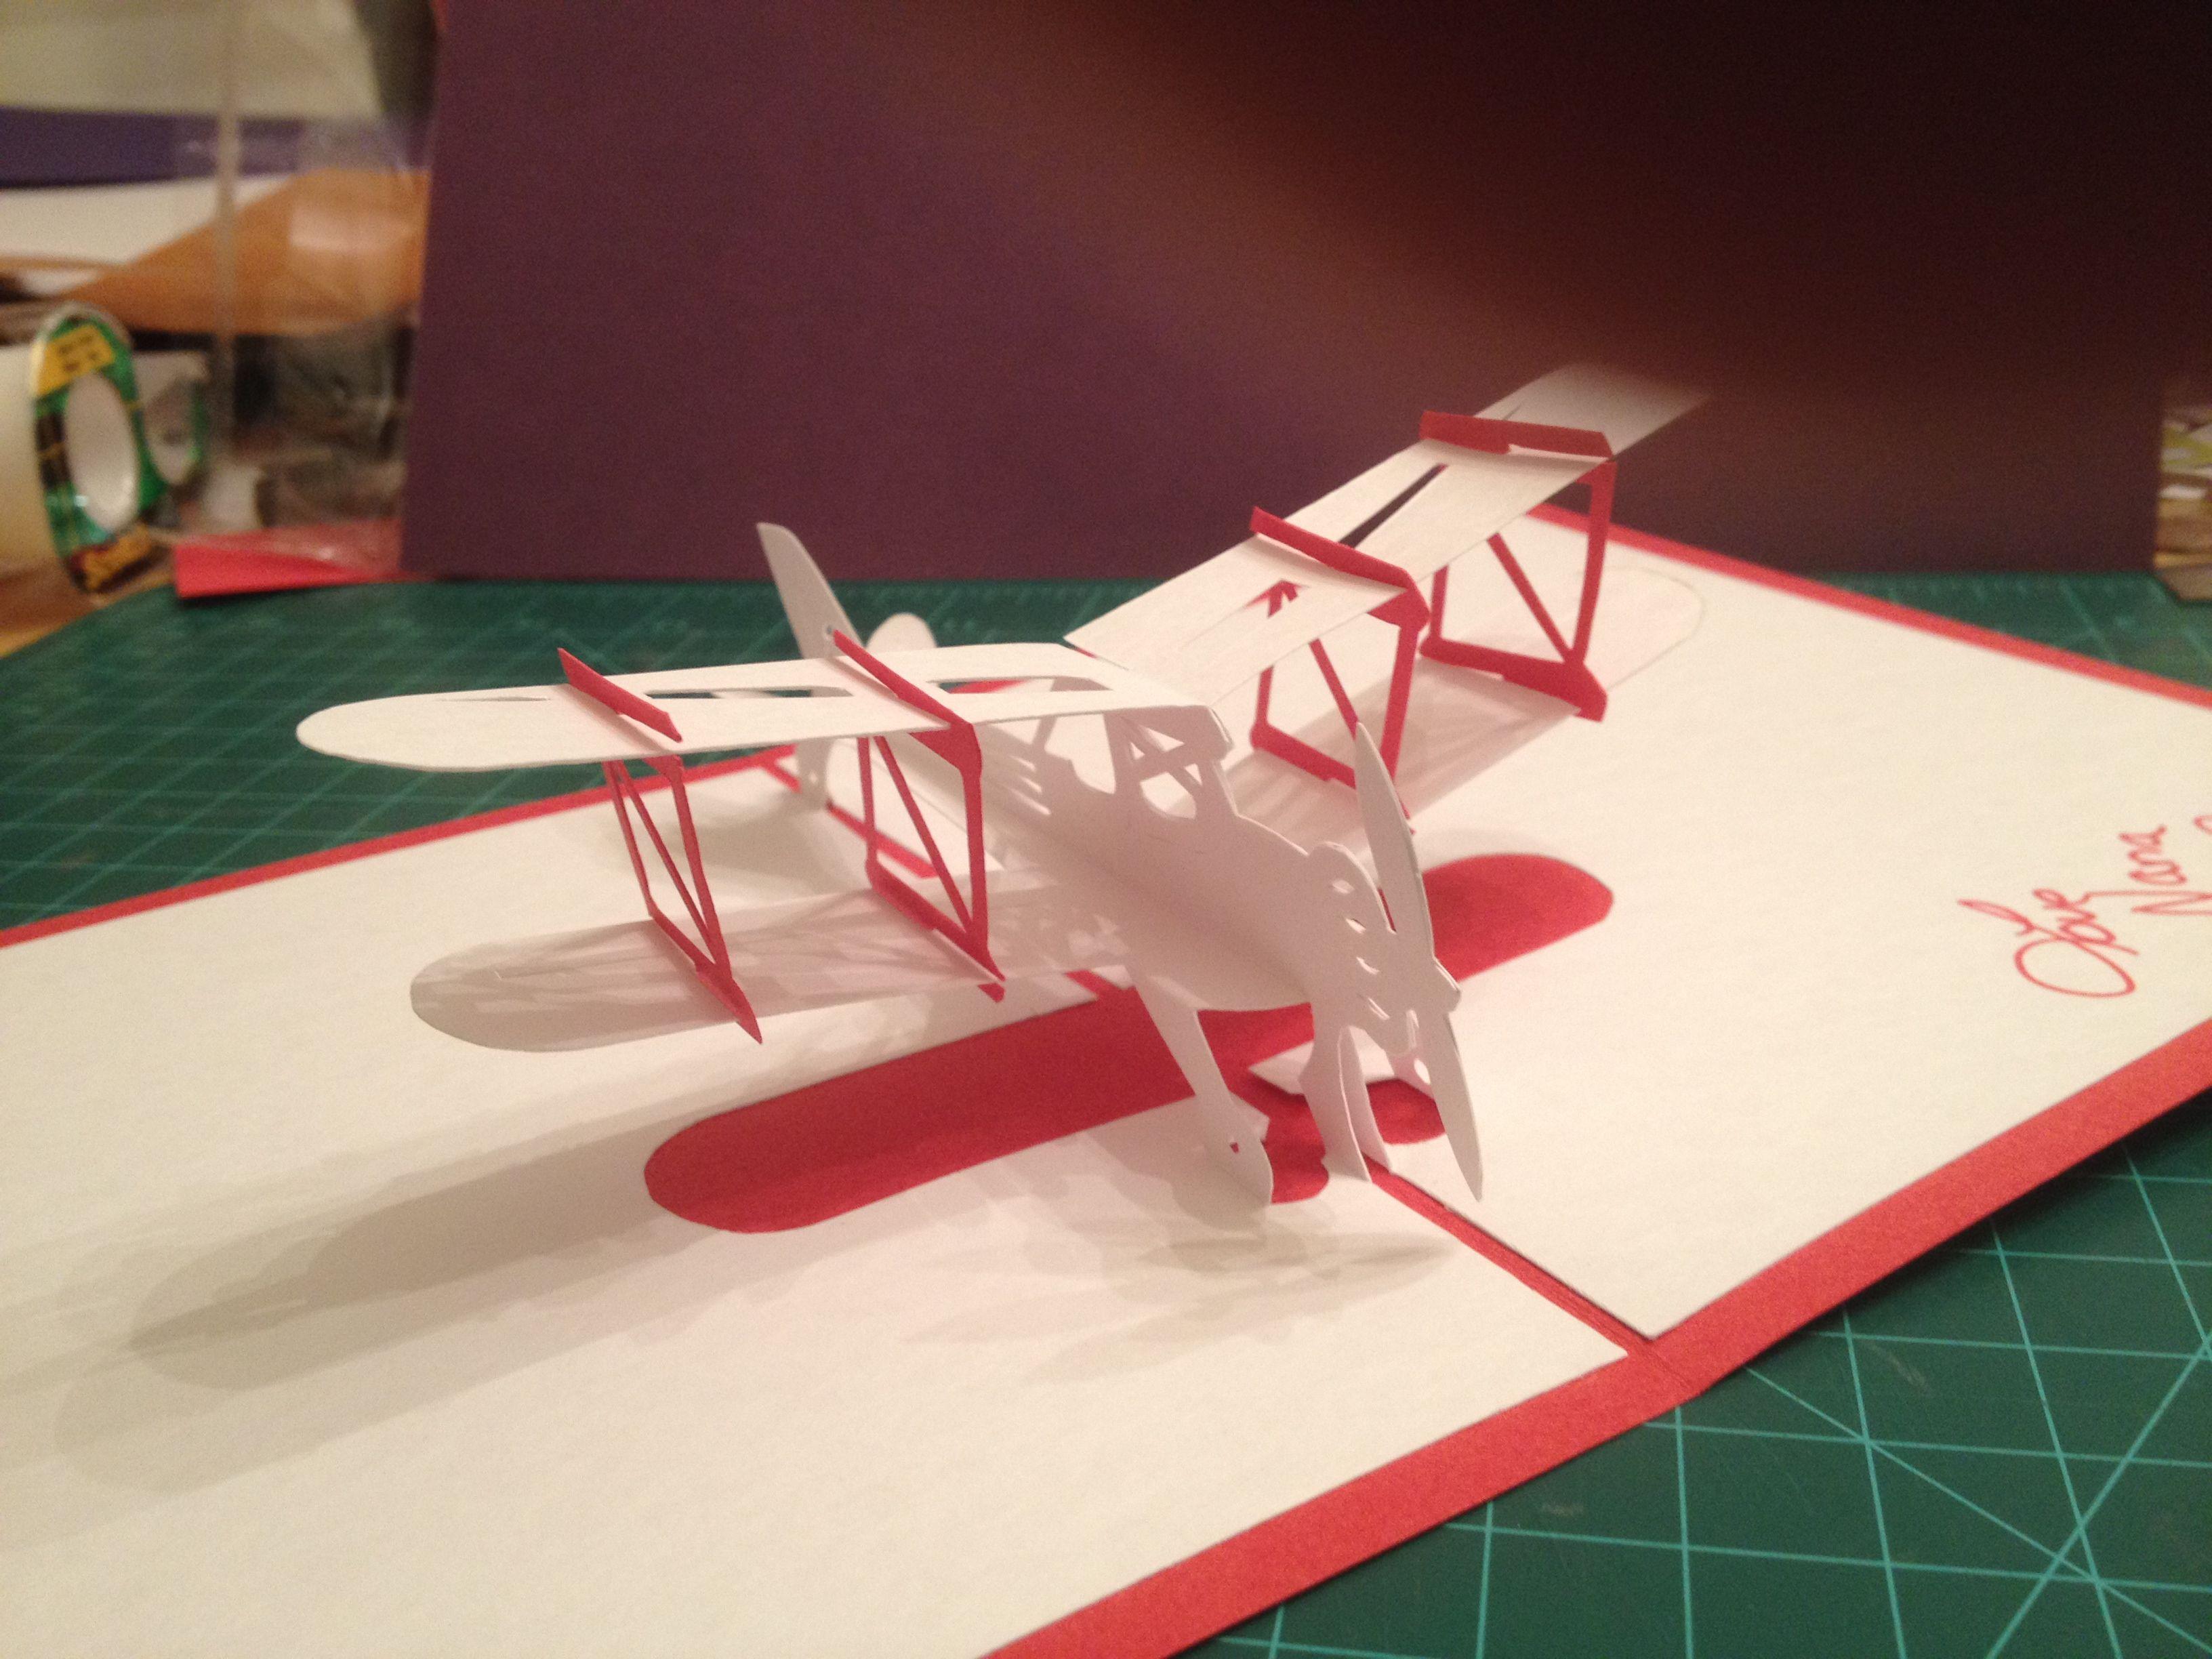 Bi Plane Pop Up Card Template From Cahier De Kirigami Moyens De